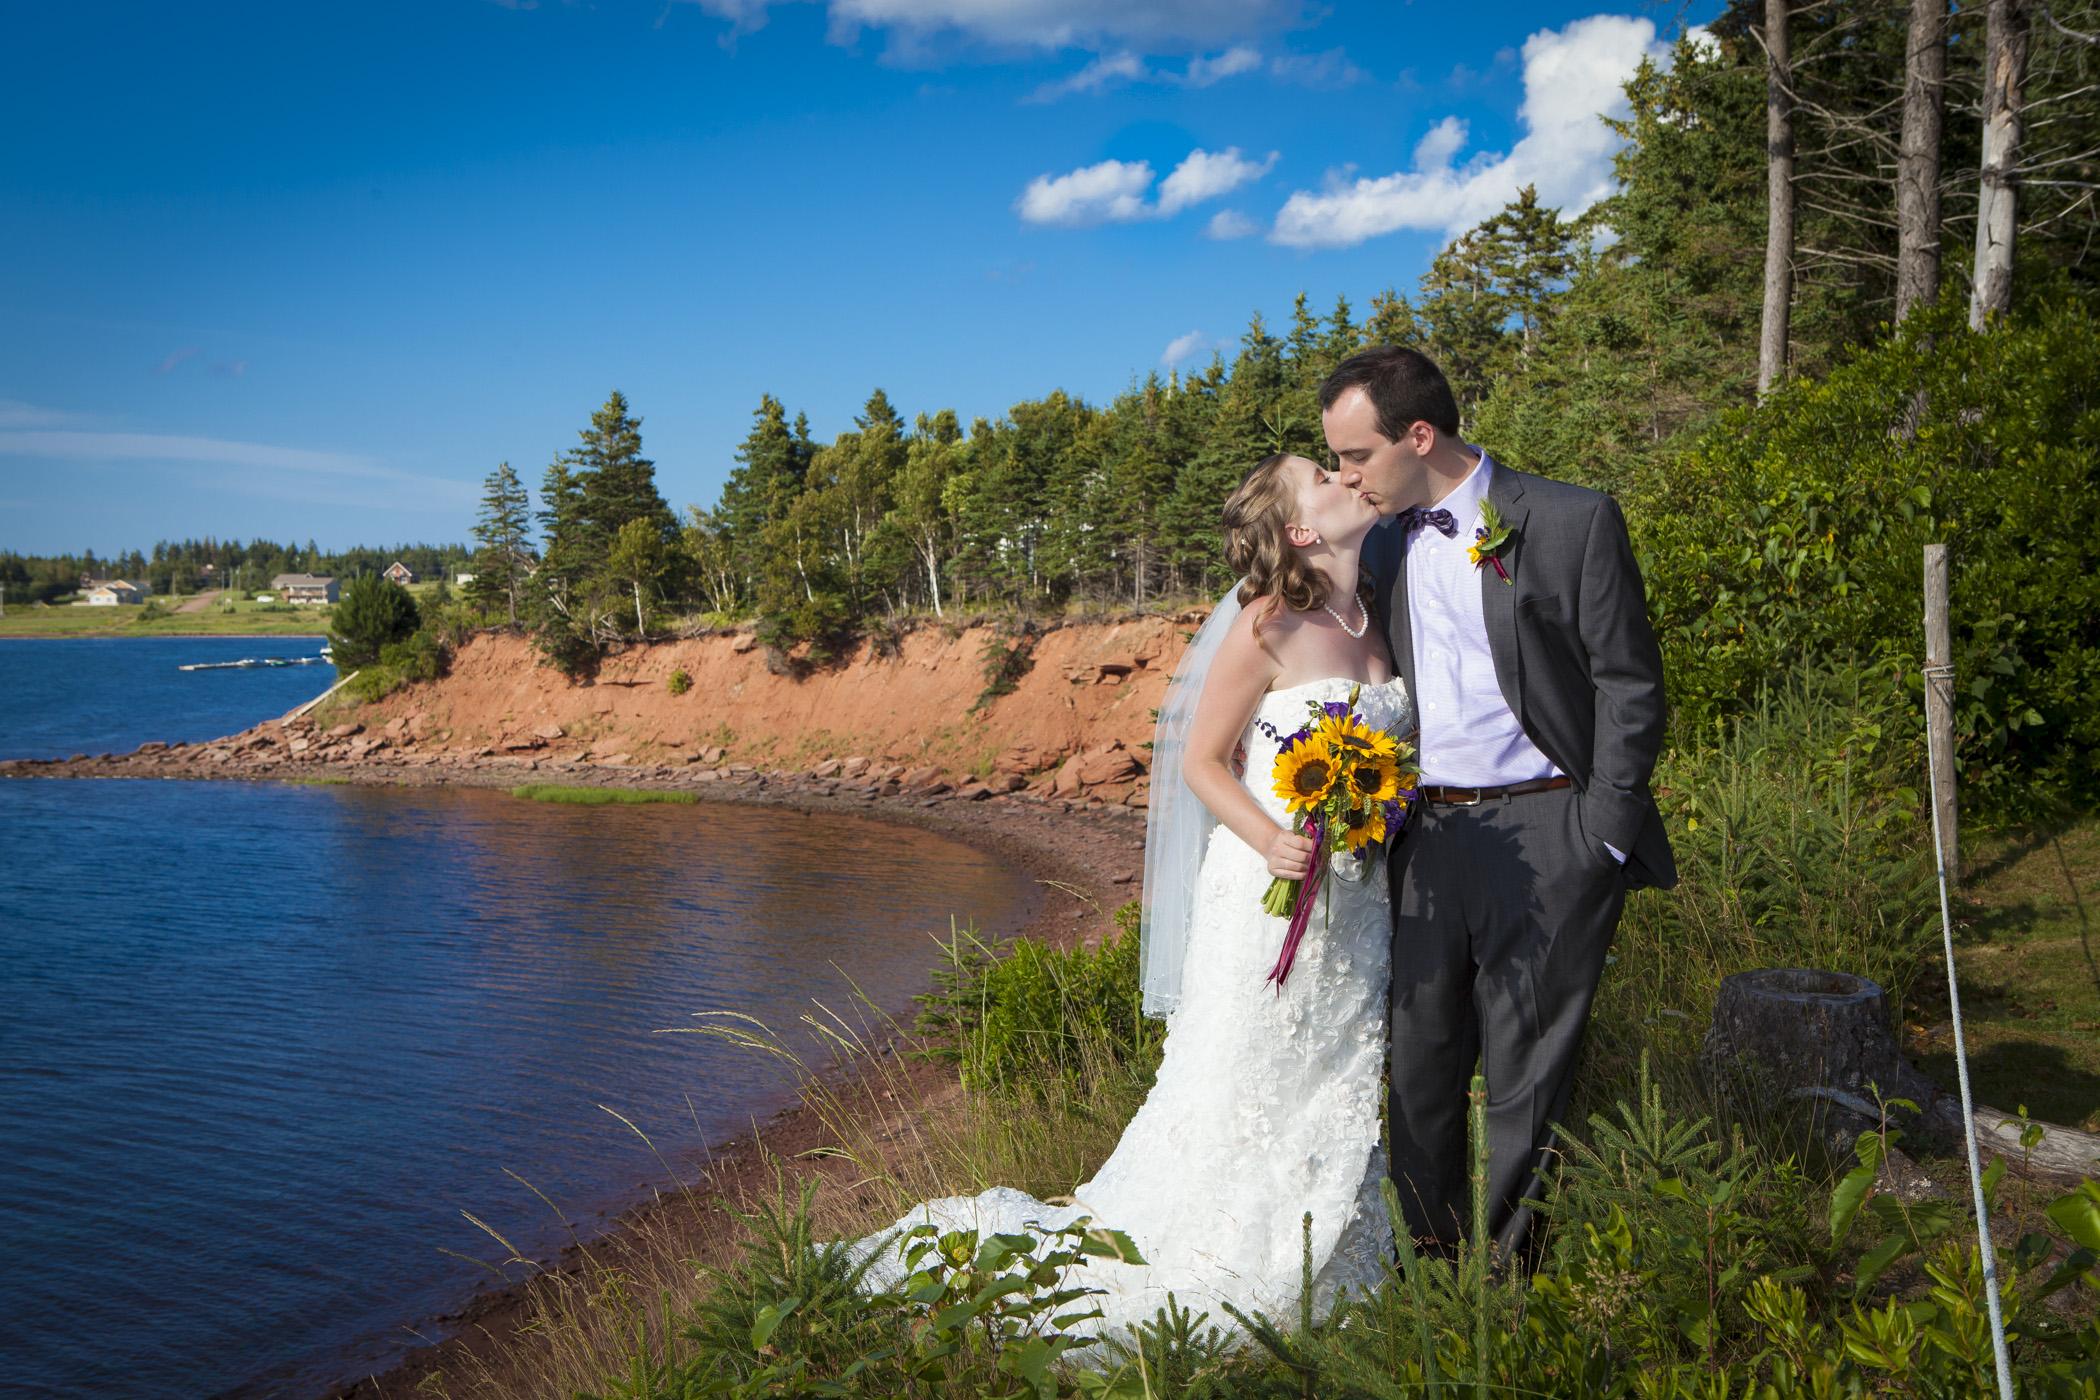 Prince Edward Island Photo of Bride and Groom taken by PEI Wedding Photographer